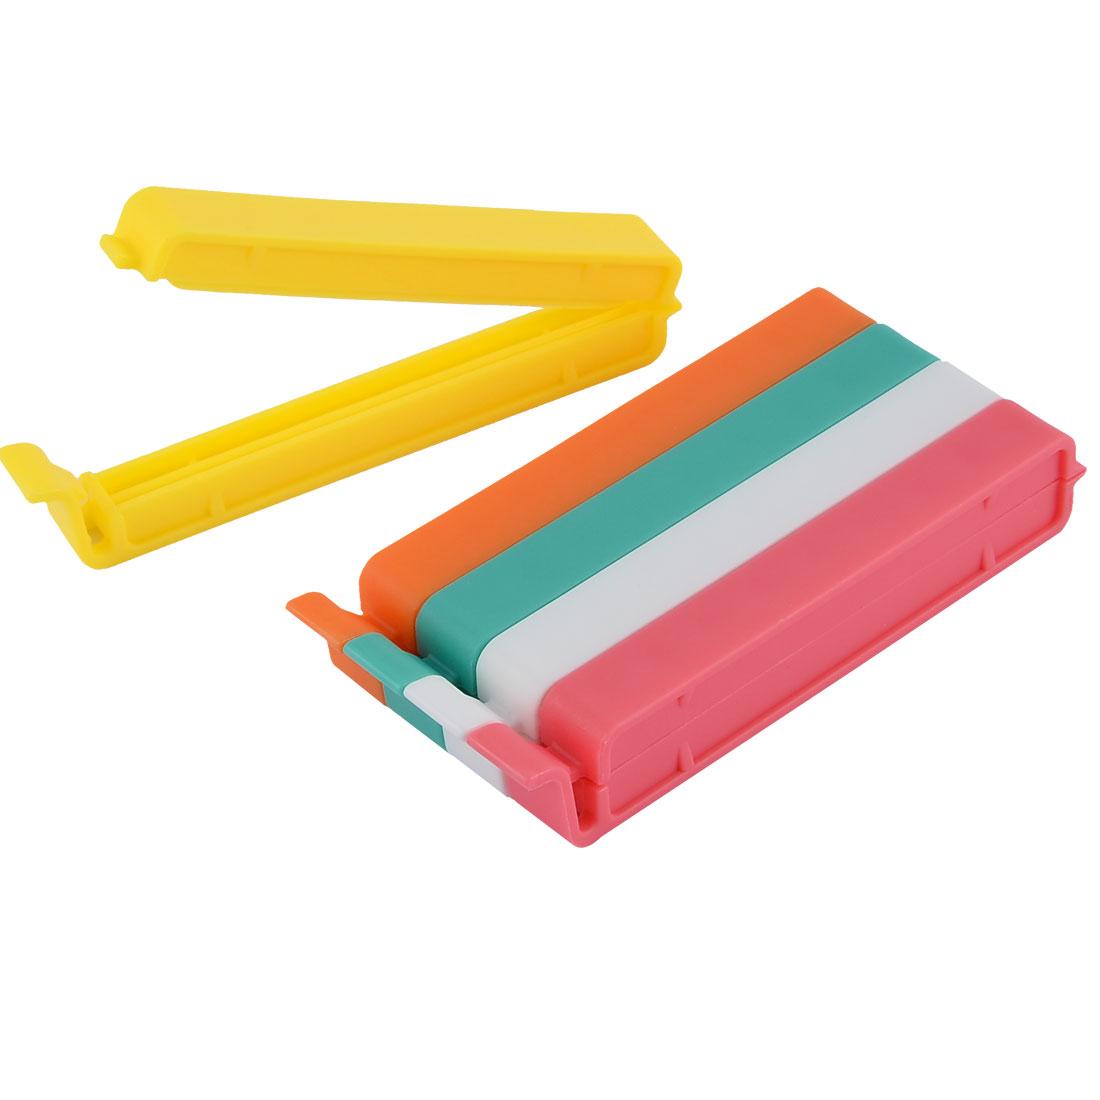 Home Kitchen Food Snacks Chips Plastic Bag Seal Sealing Clips Clamp Sealer 5pcs